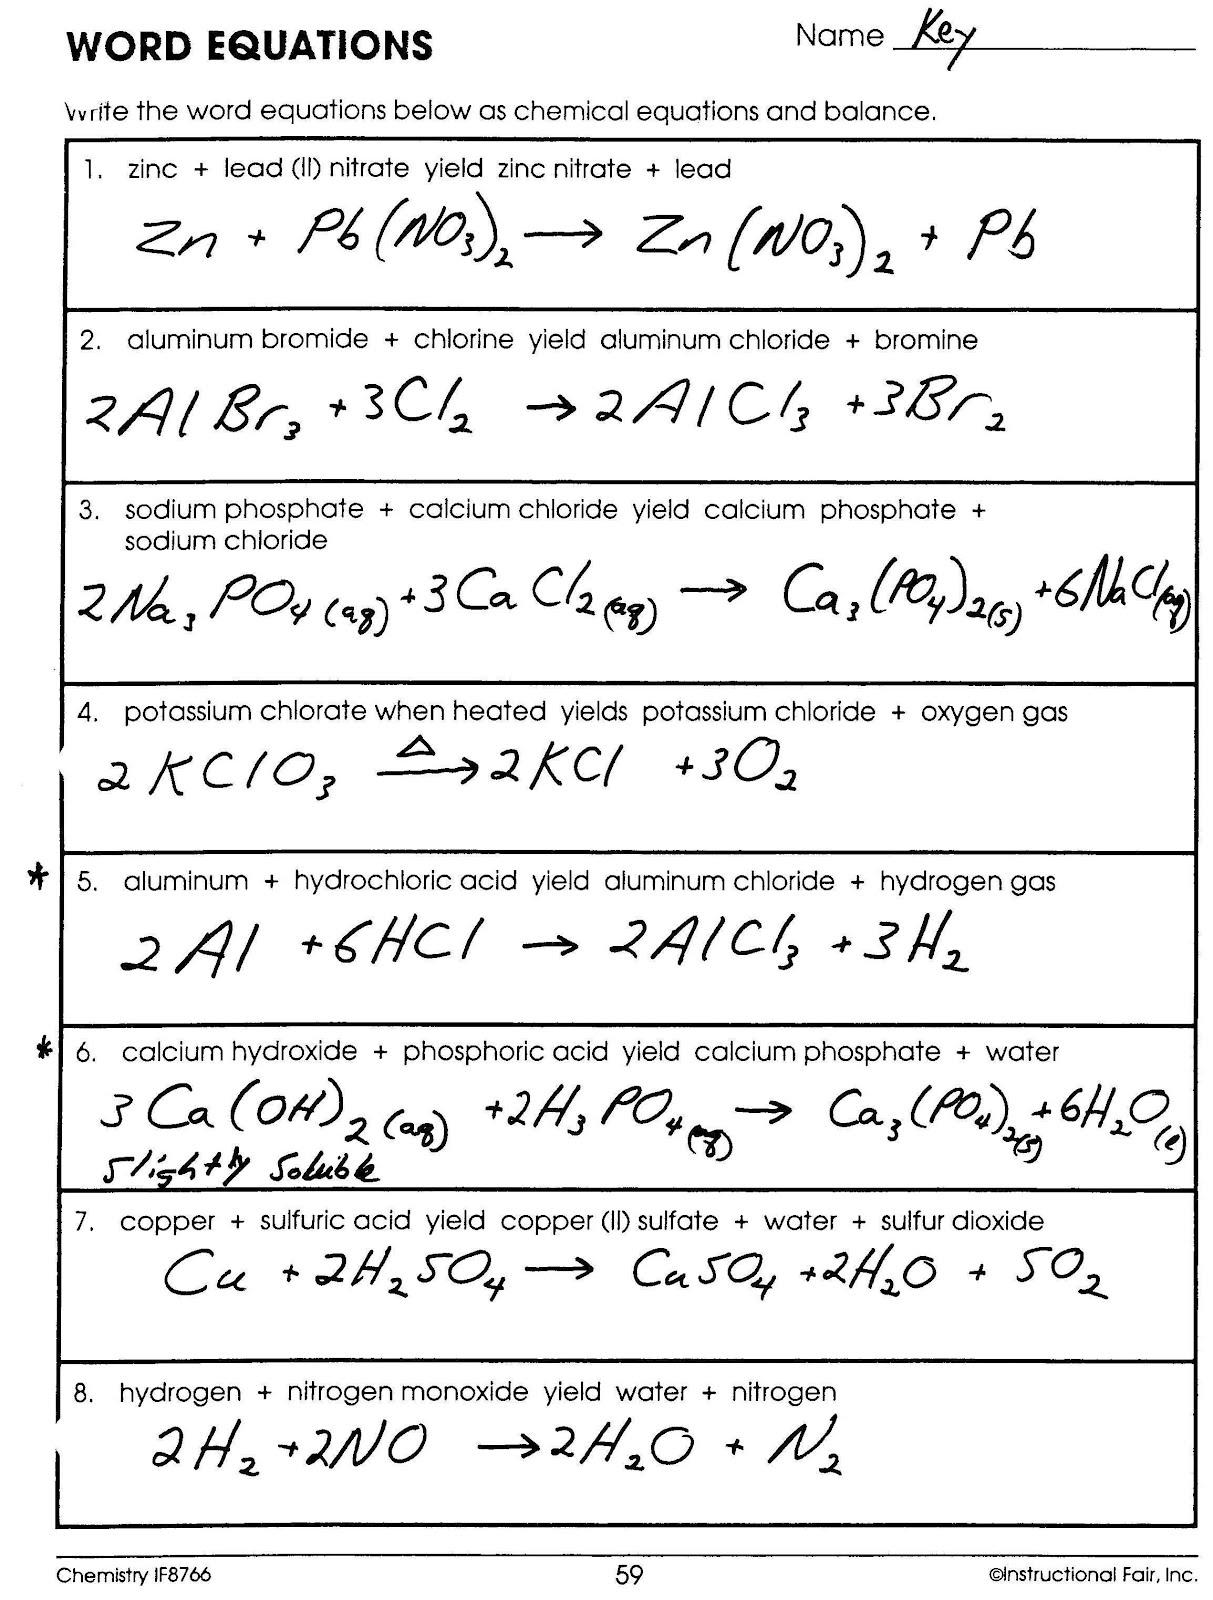 worksheet. Word Equations Worksheet Answers. Grass Fedjp ...